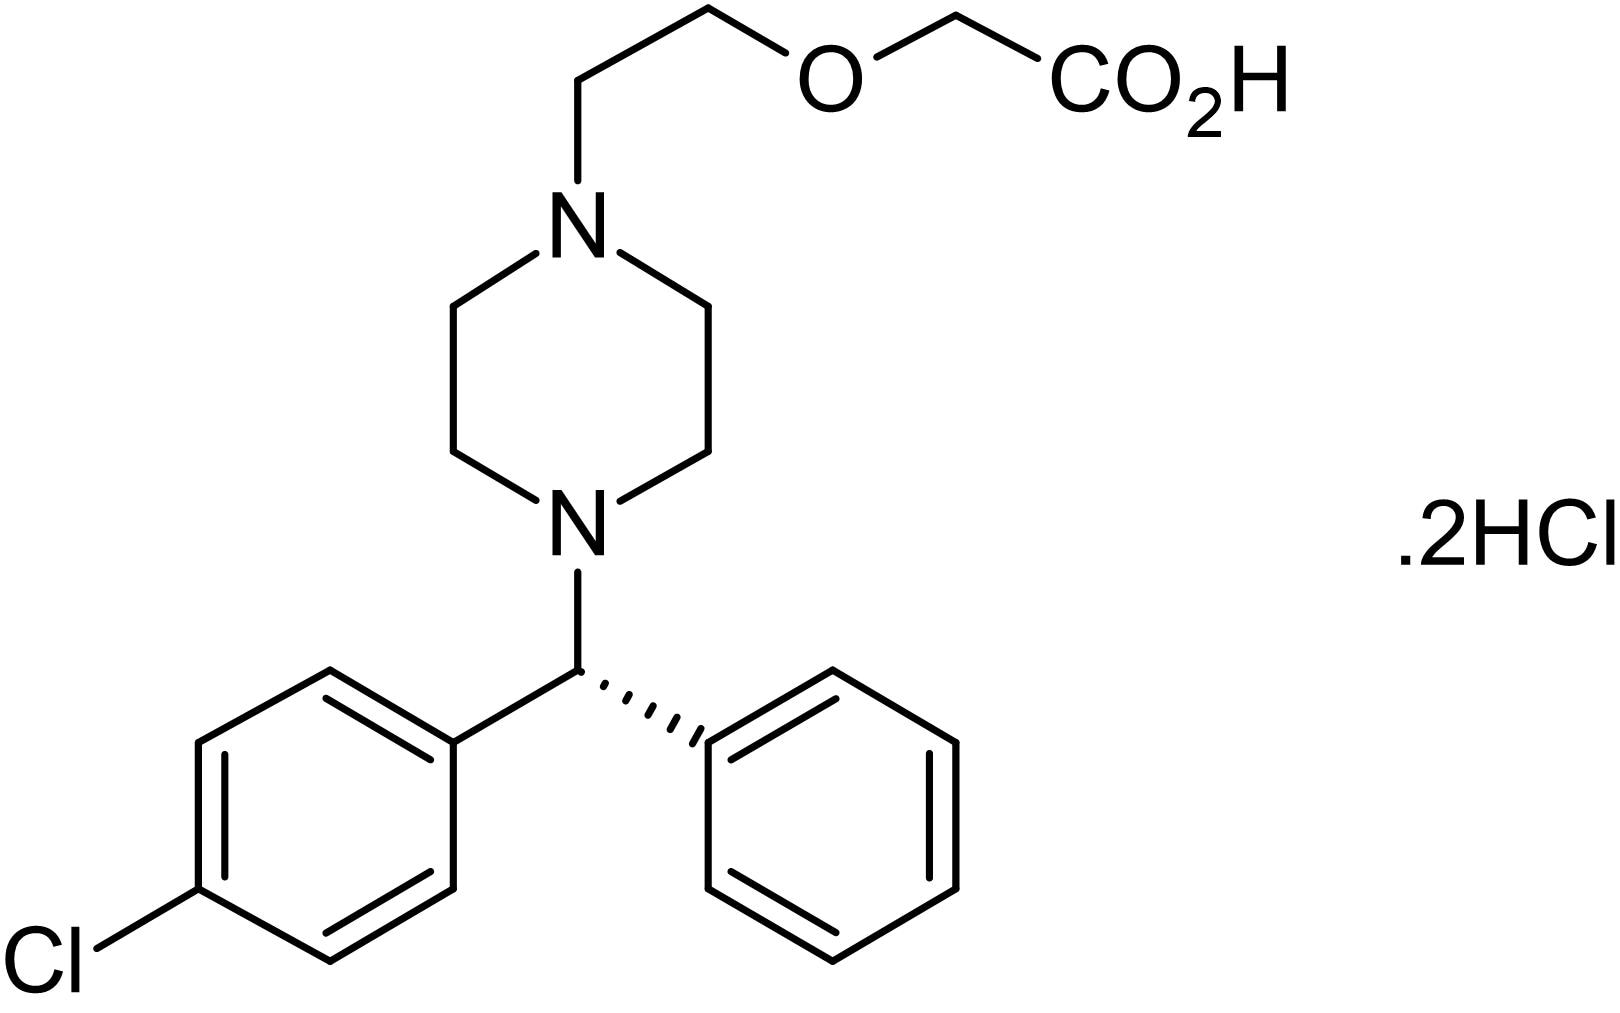 Chemical Structure - Levocetirizine dihydrochloride, H<sub>1</sub> receptor antagonist (ab141947)